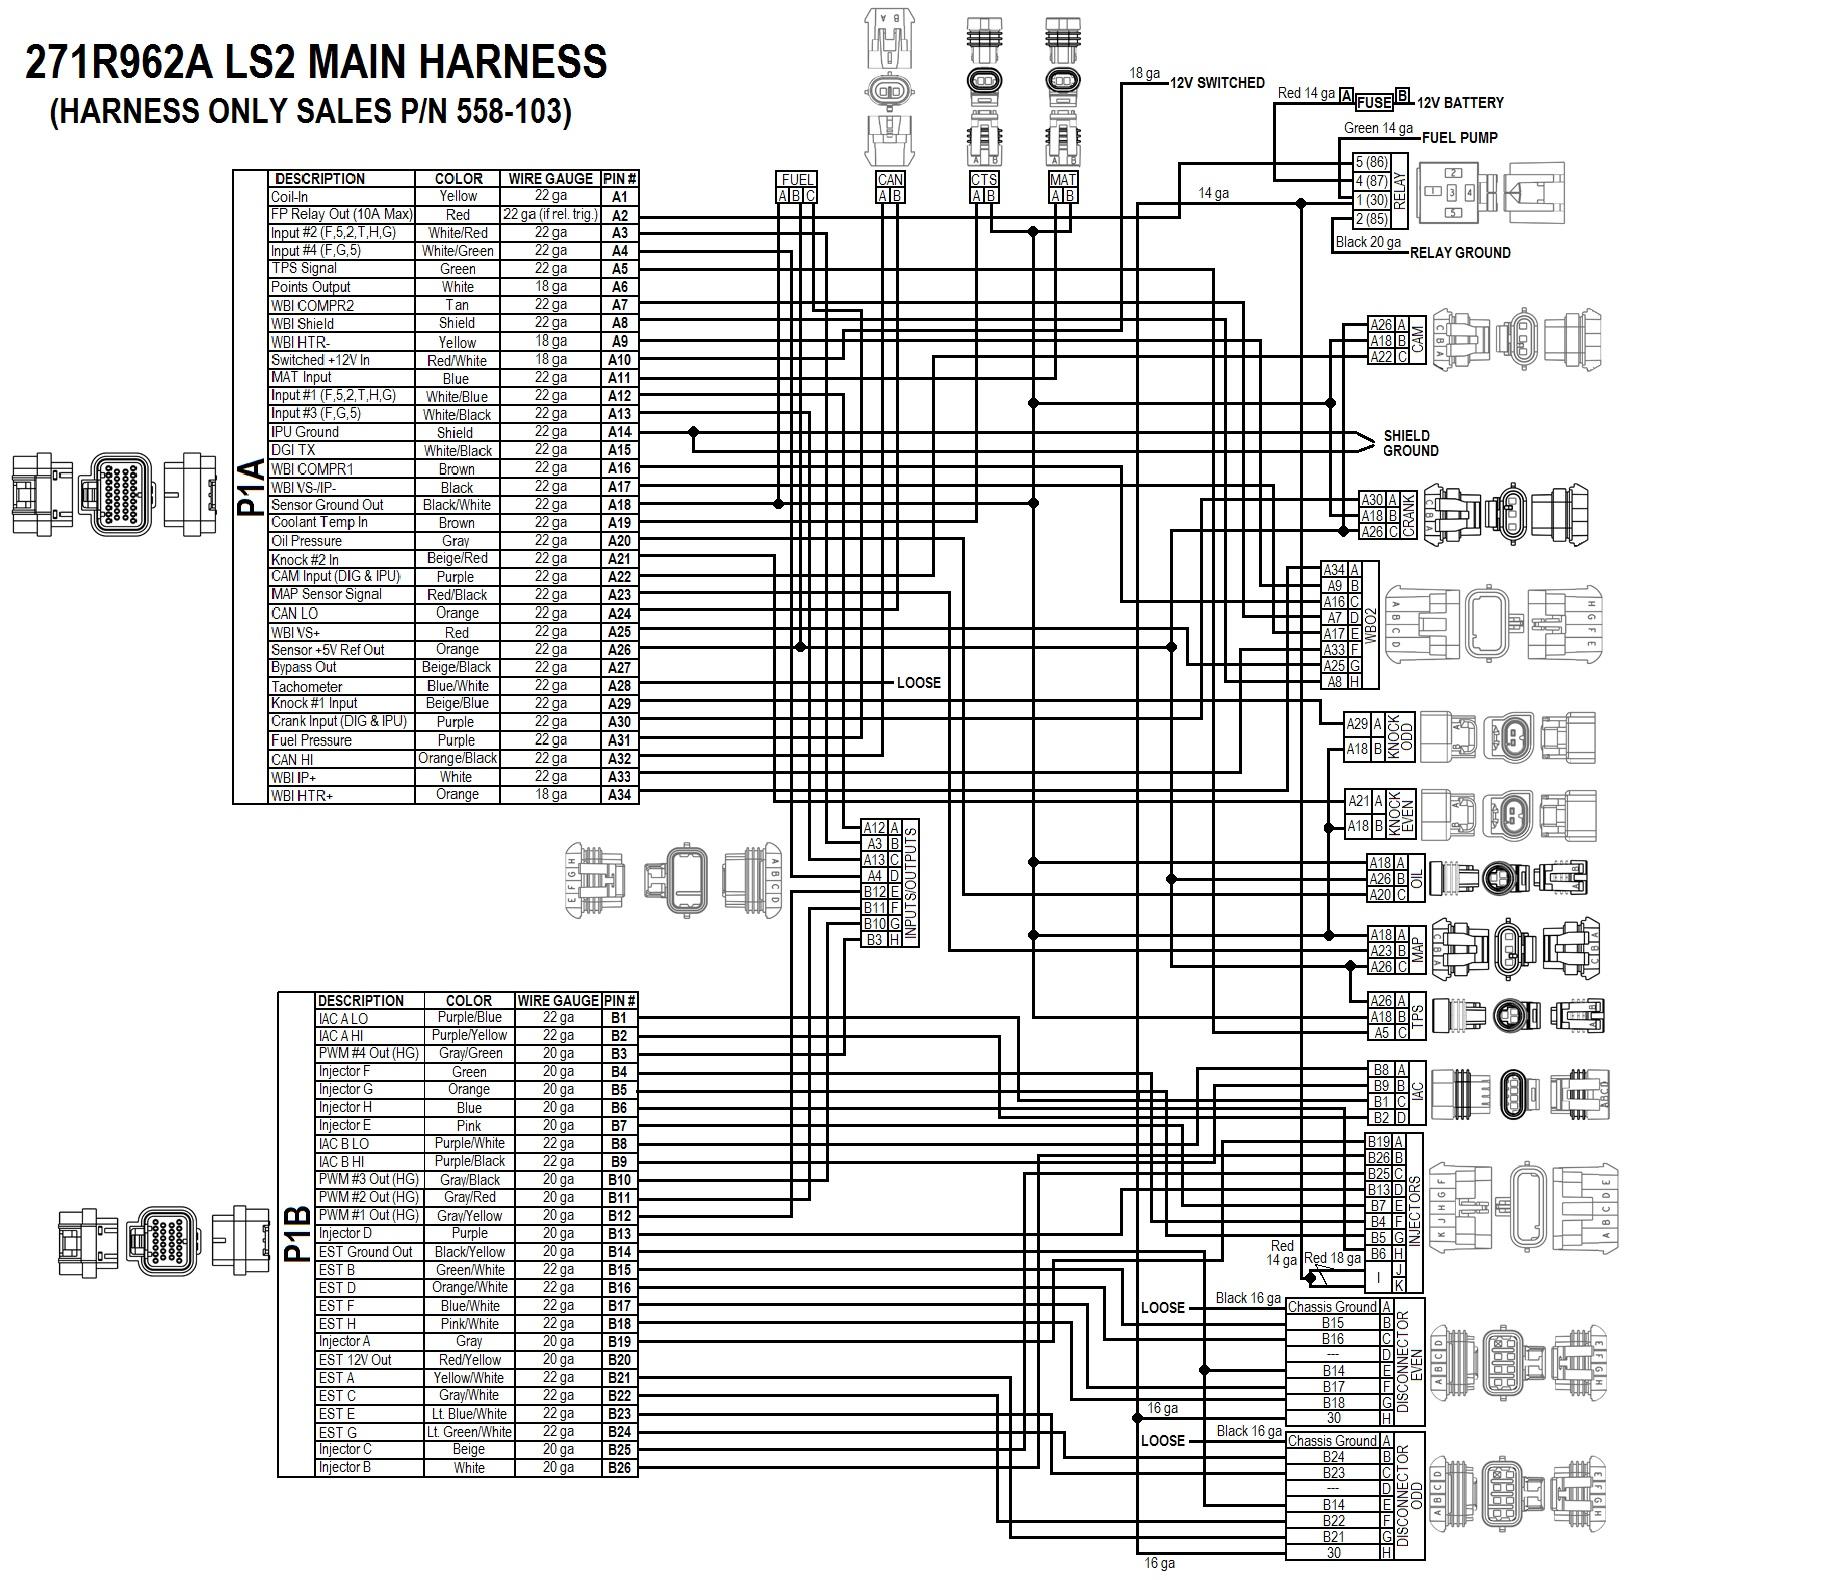 Holley Fuel Pump Wiring Diagram. . Wiring Diagram on